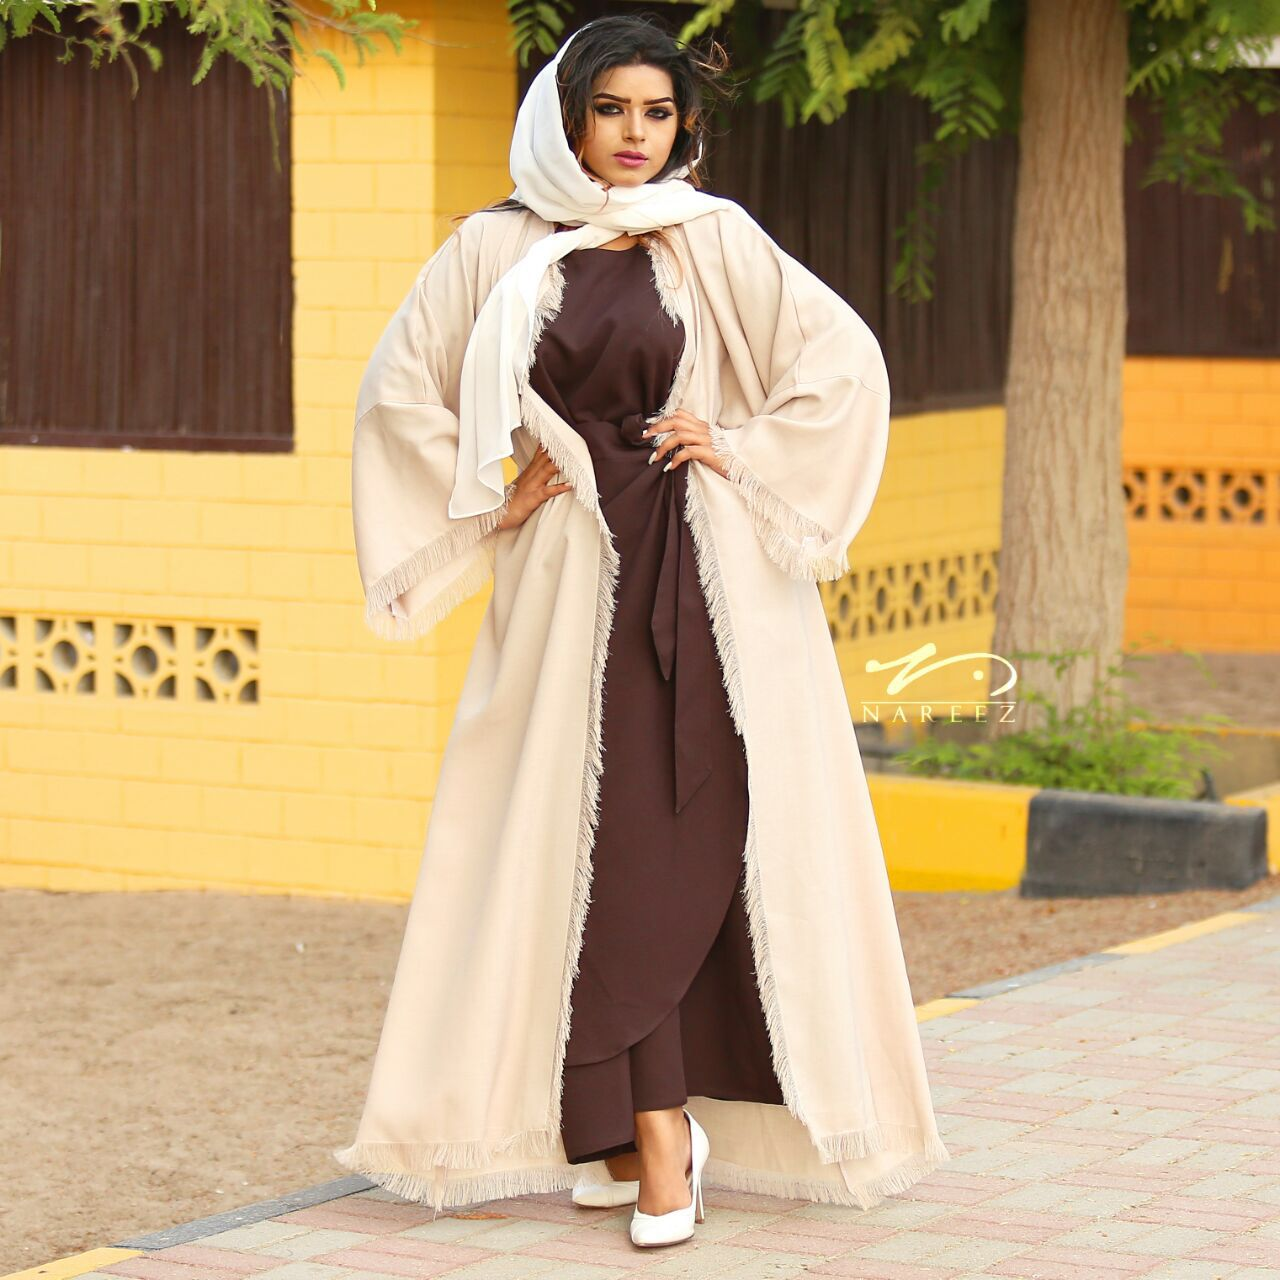 69bde2212 عبايات عملية ناريز بوتيك   Nareez   Fashion dresses, Fashion, Dresses